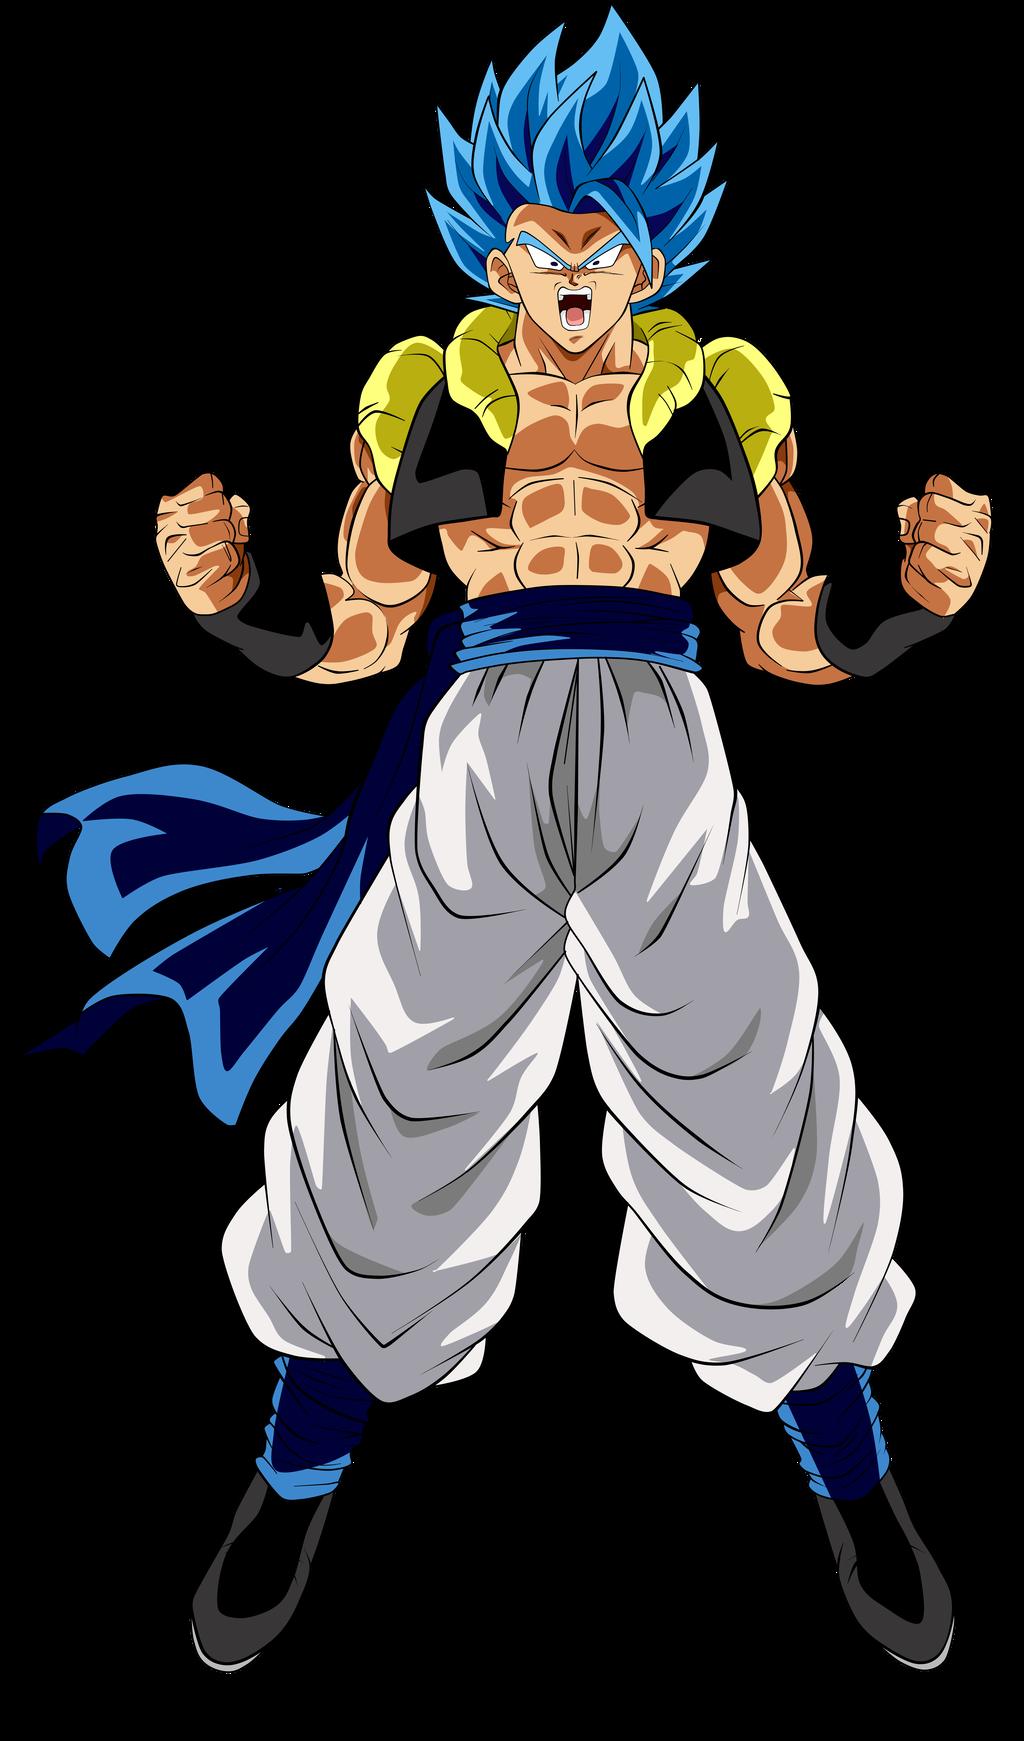 Gogeta Super Saiyan Blue by ChronoFz on DeviantArt | Dragon ball super  manga, Anime dragon ball super, Dragon ball super